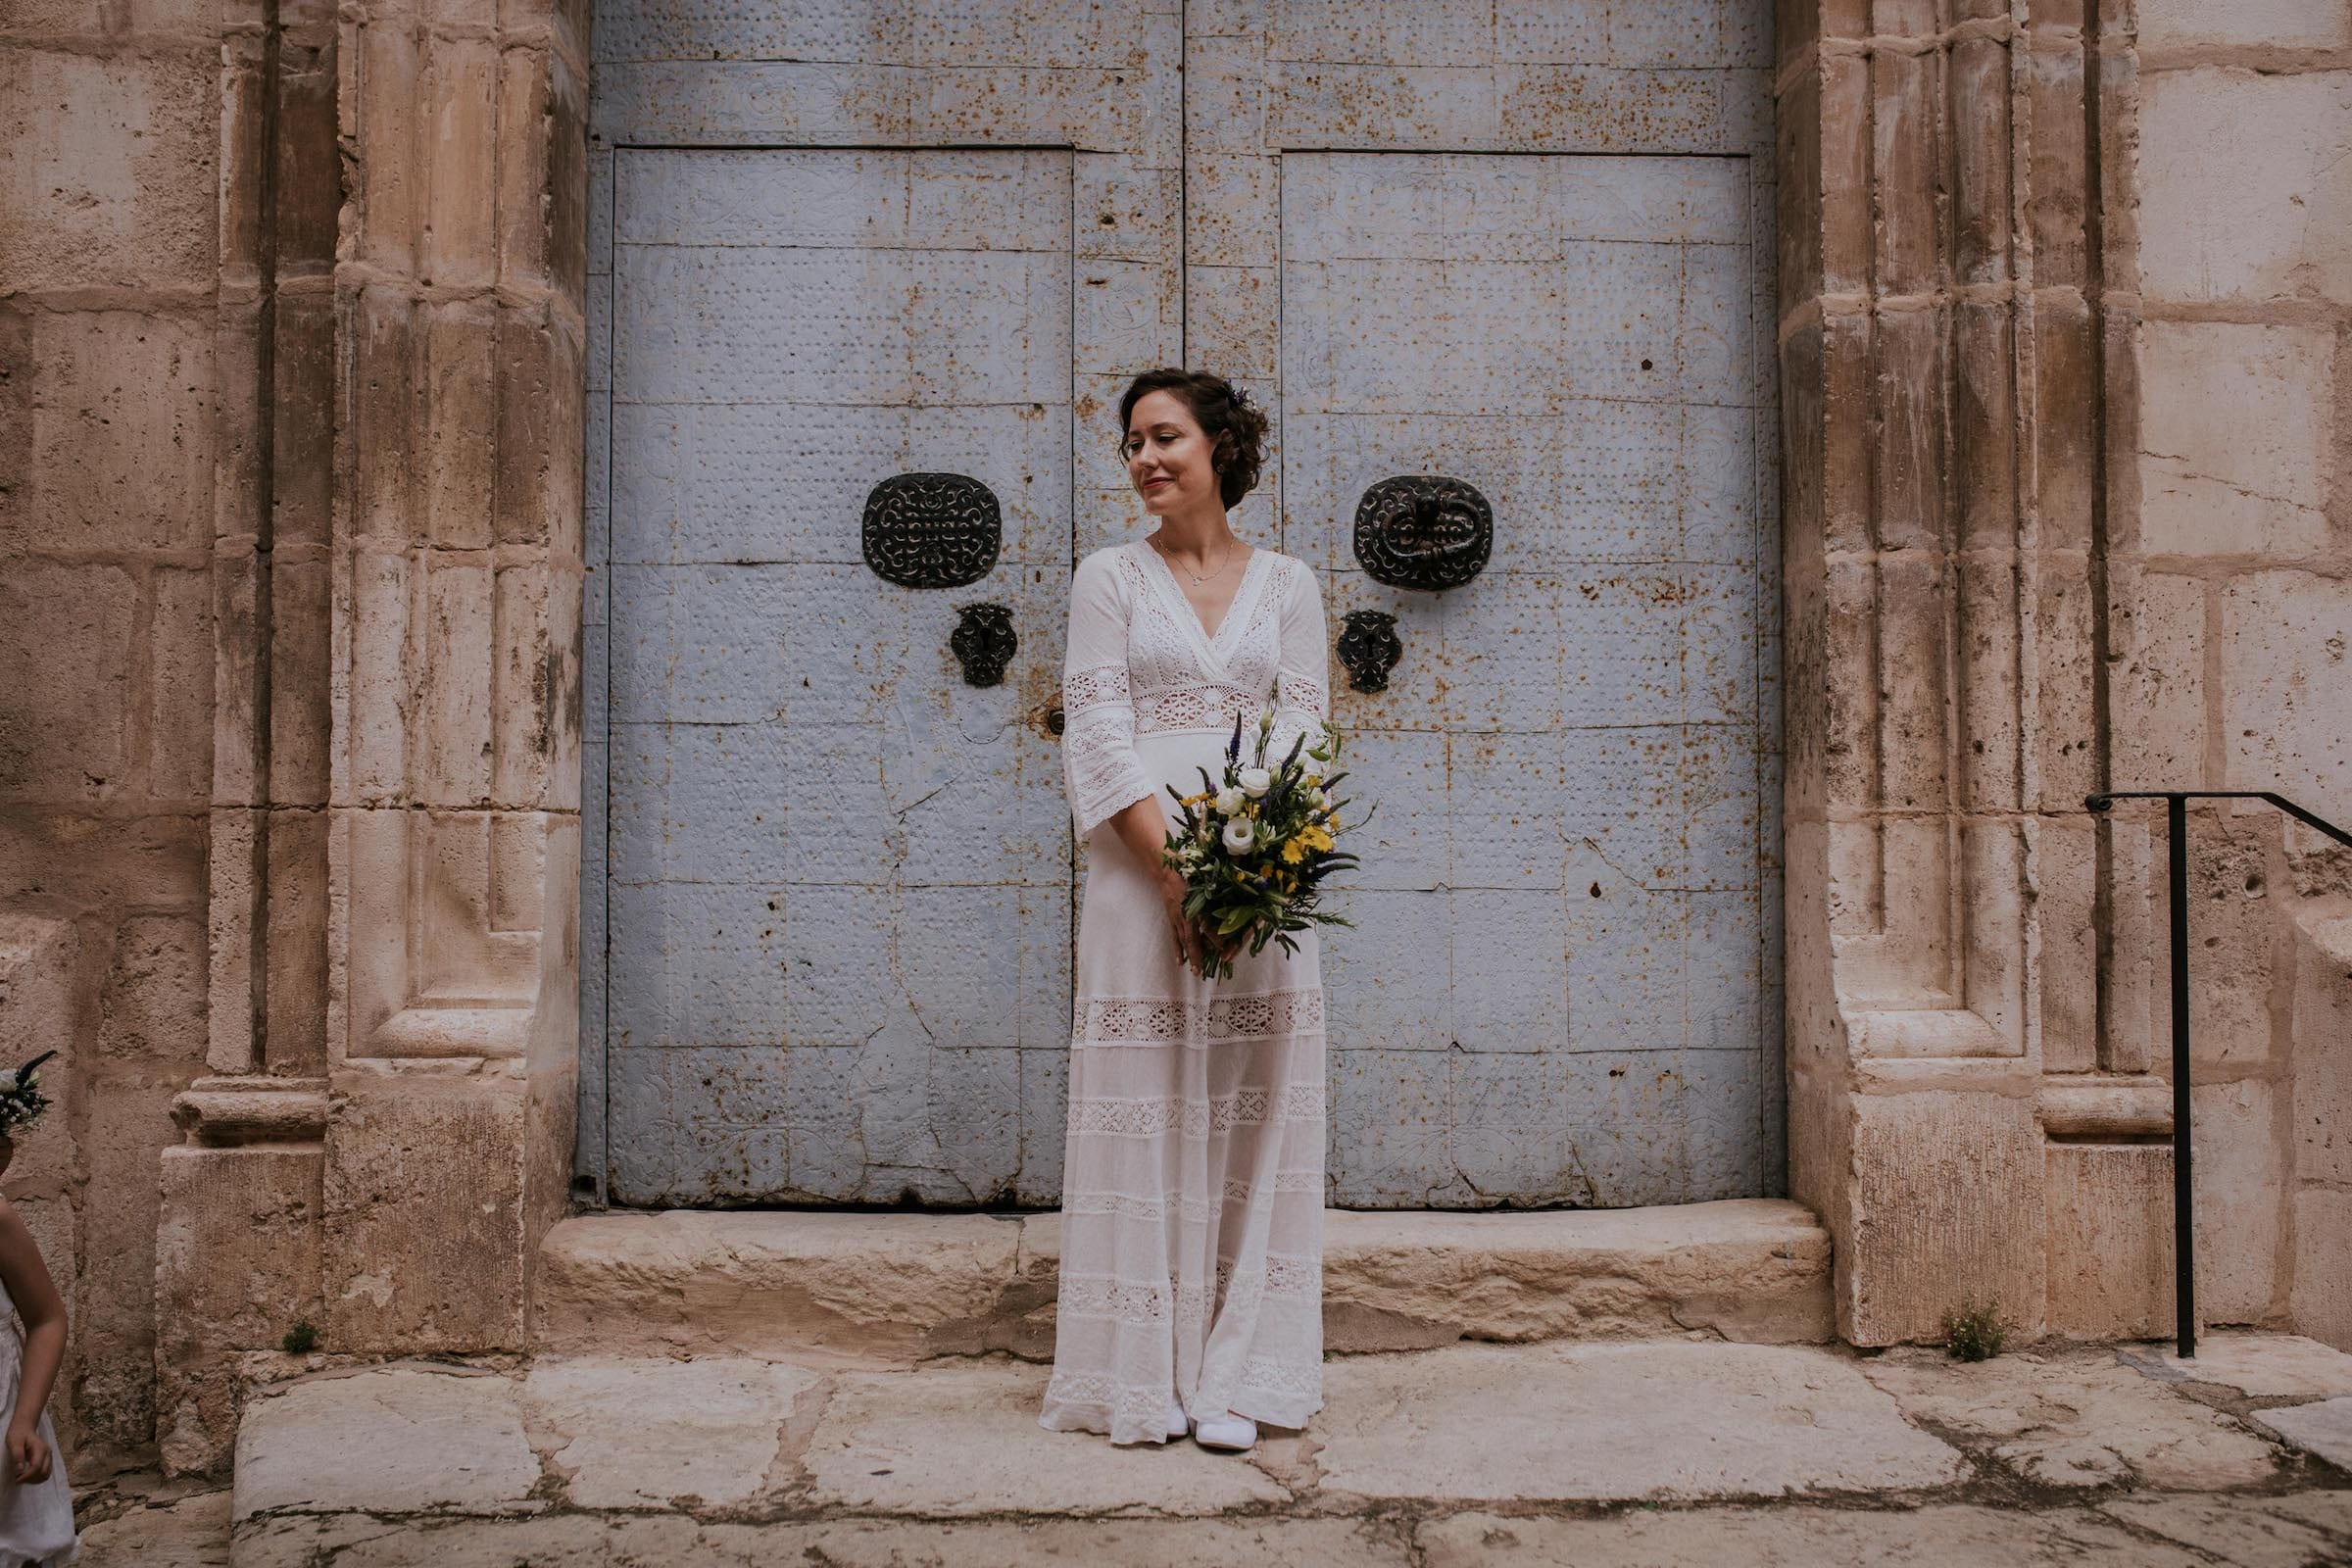 036+wedding+in+valencia+weddingphotographer.jpg